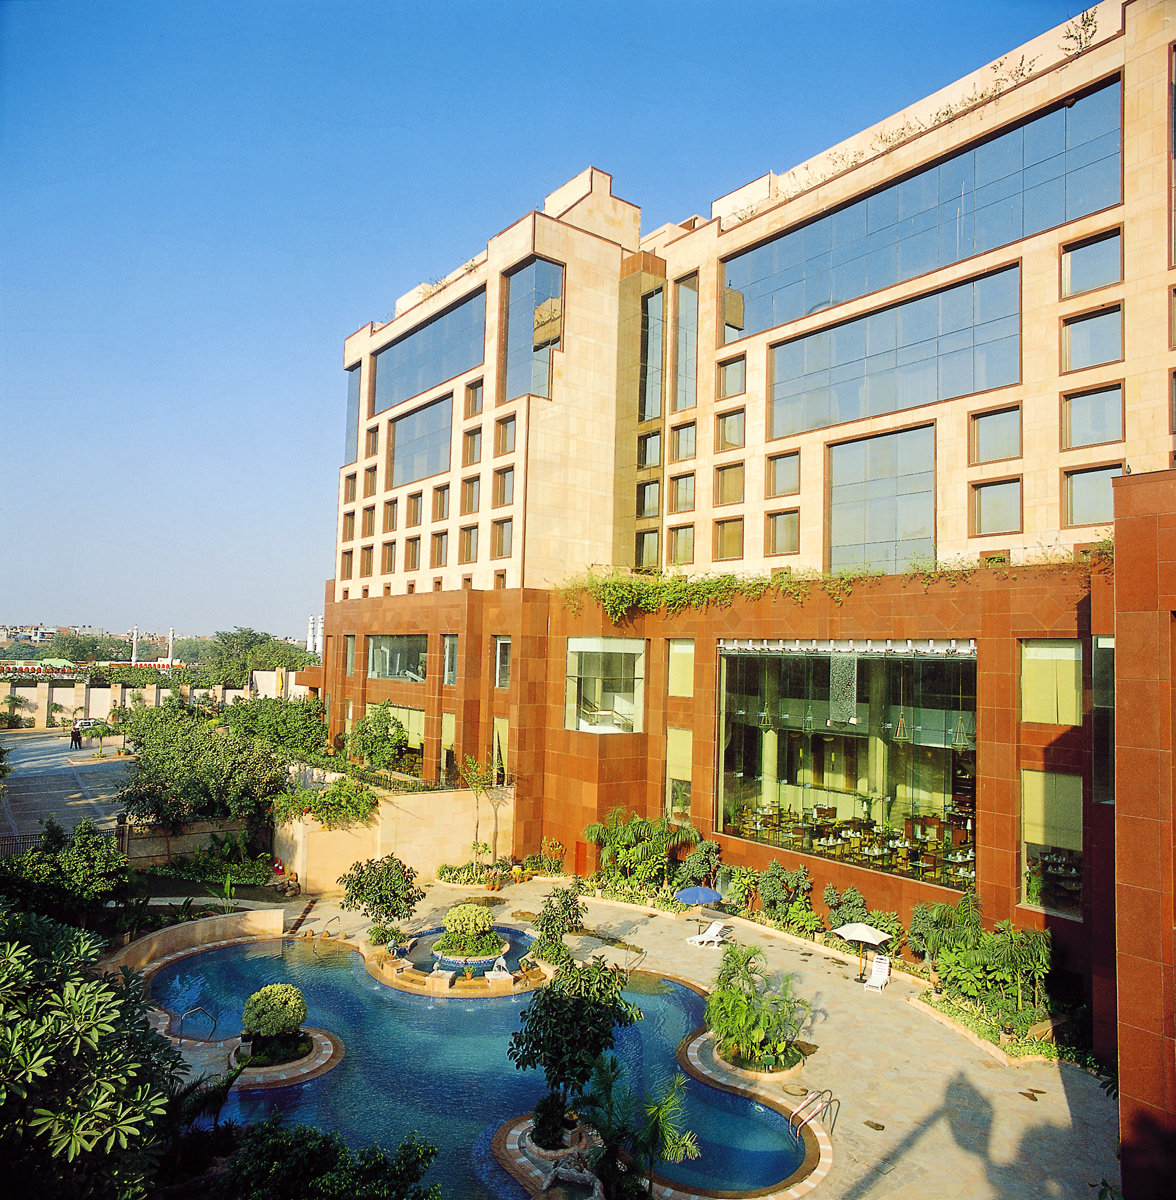 ITC Welcomhotel Sheraton New Delhi